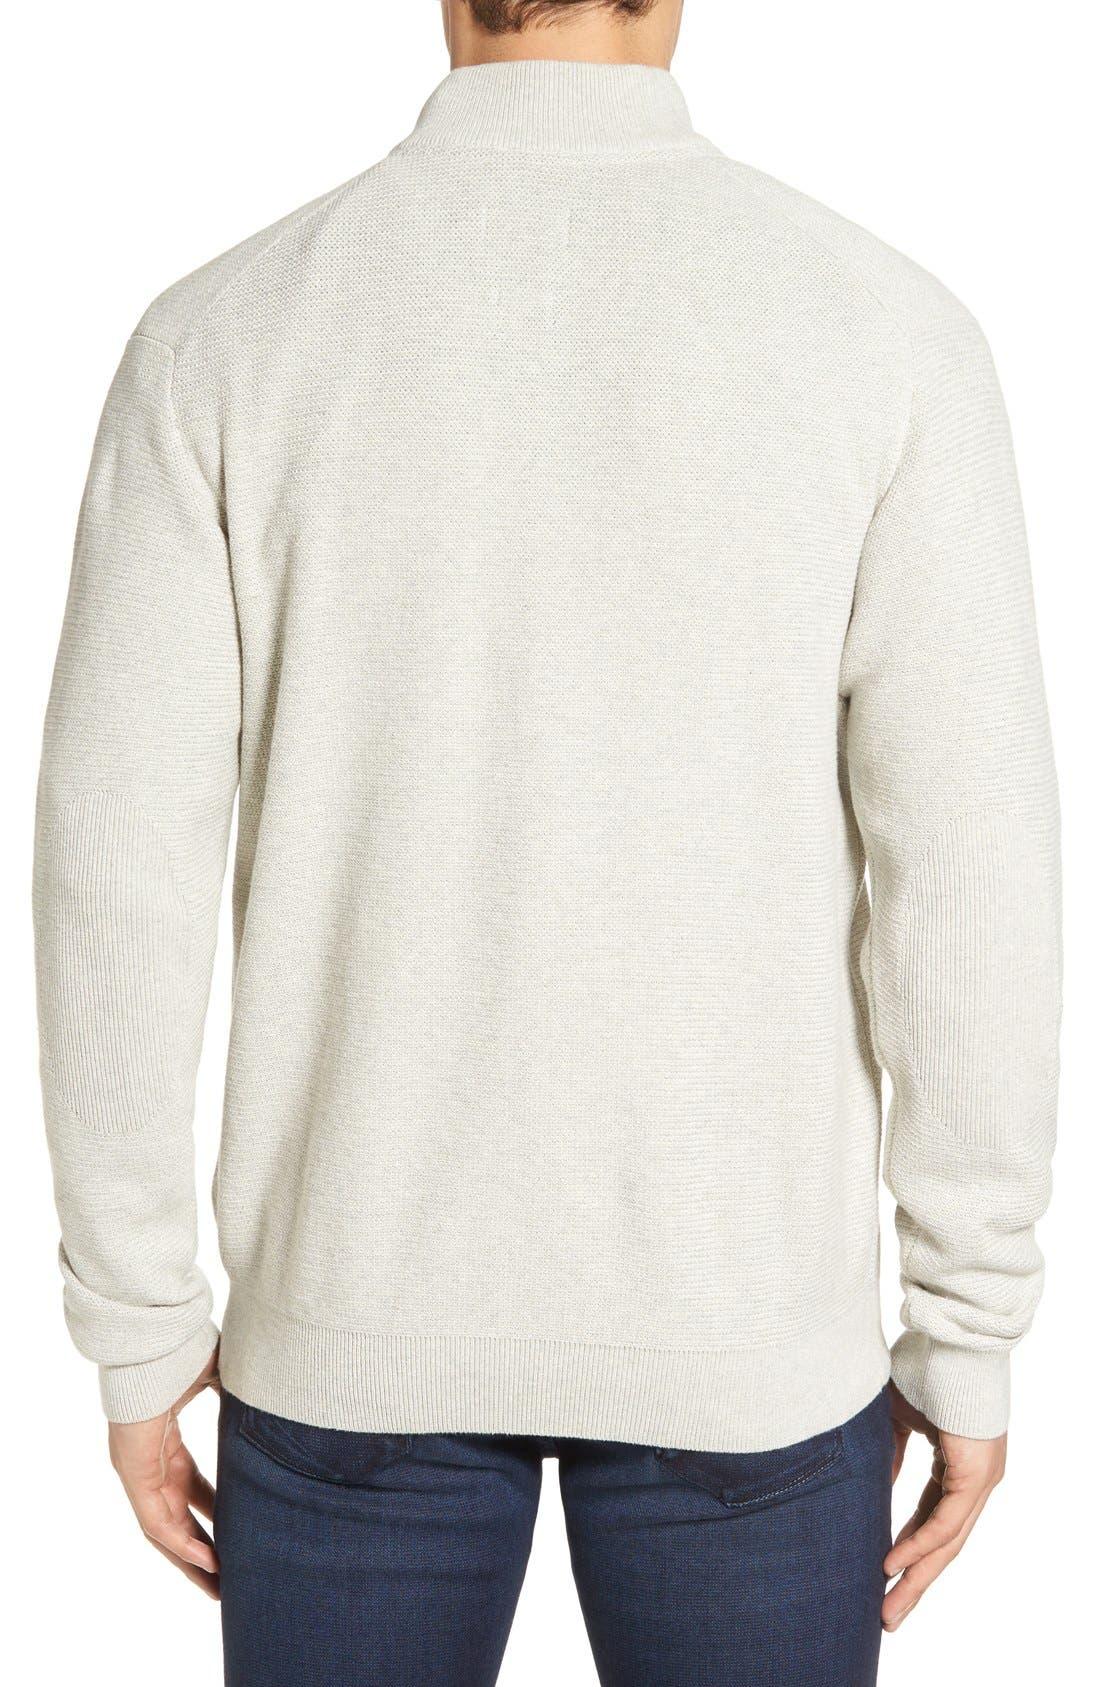 'Benson' Quarter Zip Textured Knit Sweater,                             Alternate thumbnail 2, color,                             Limestone Heather